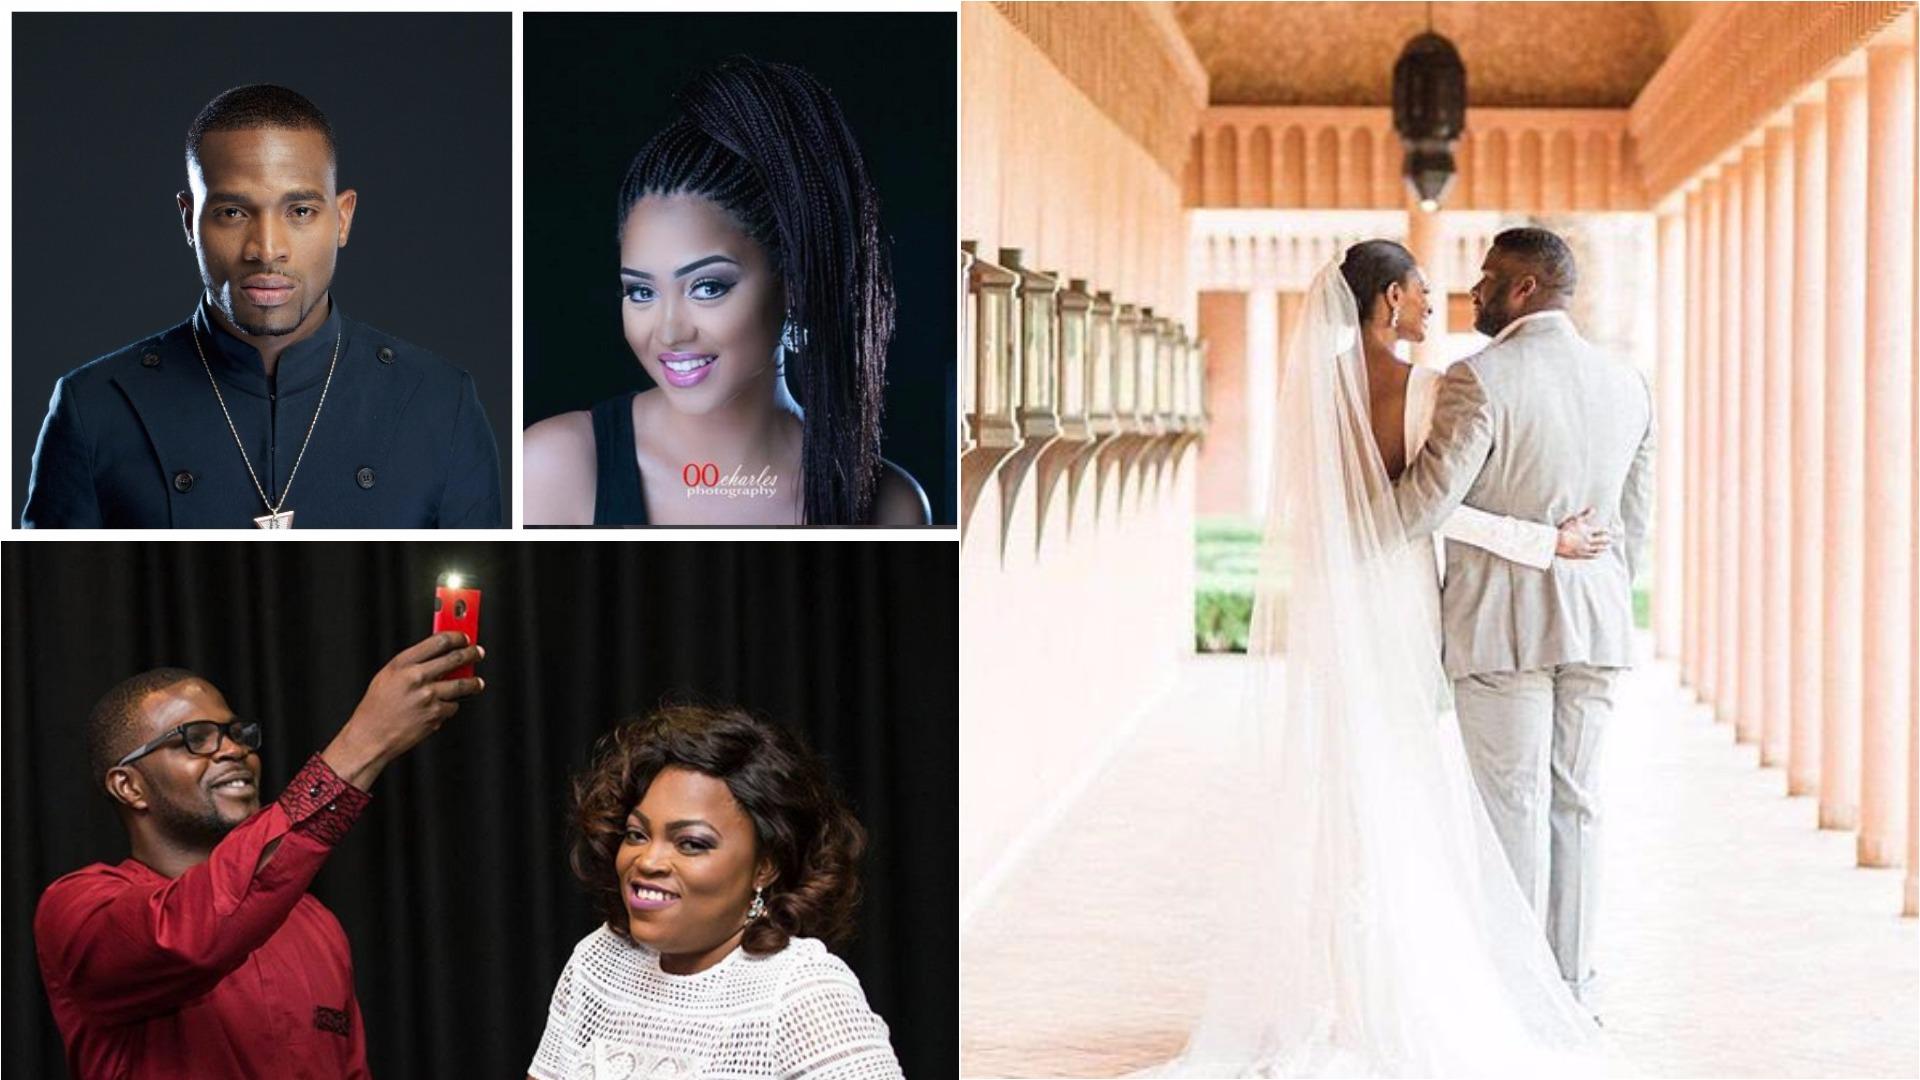 D'banj, Funke Akindele, Oritsefemi, other celebs that caught Nigerians unawares with their secret weddings